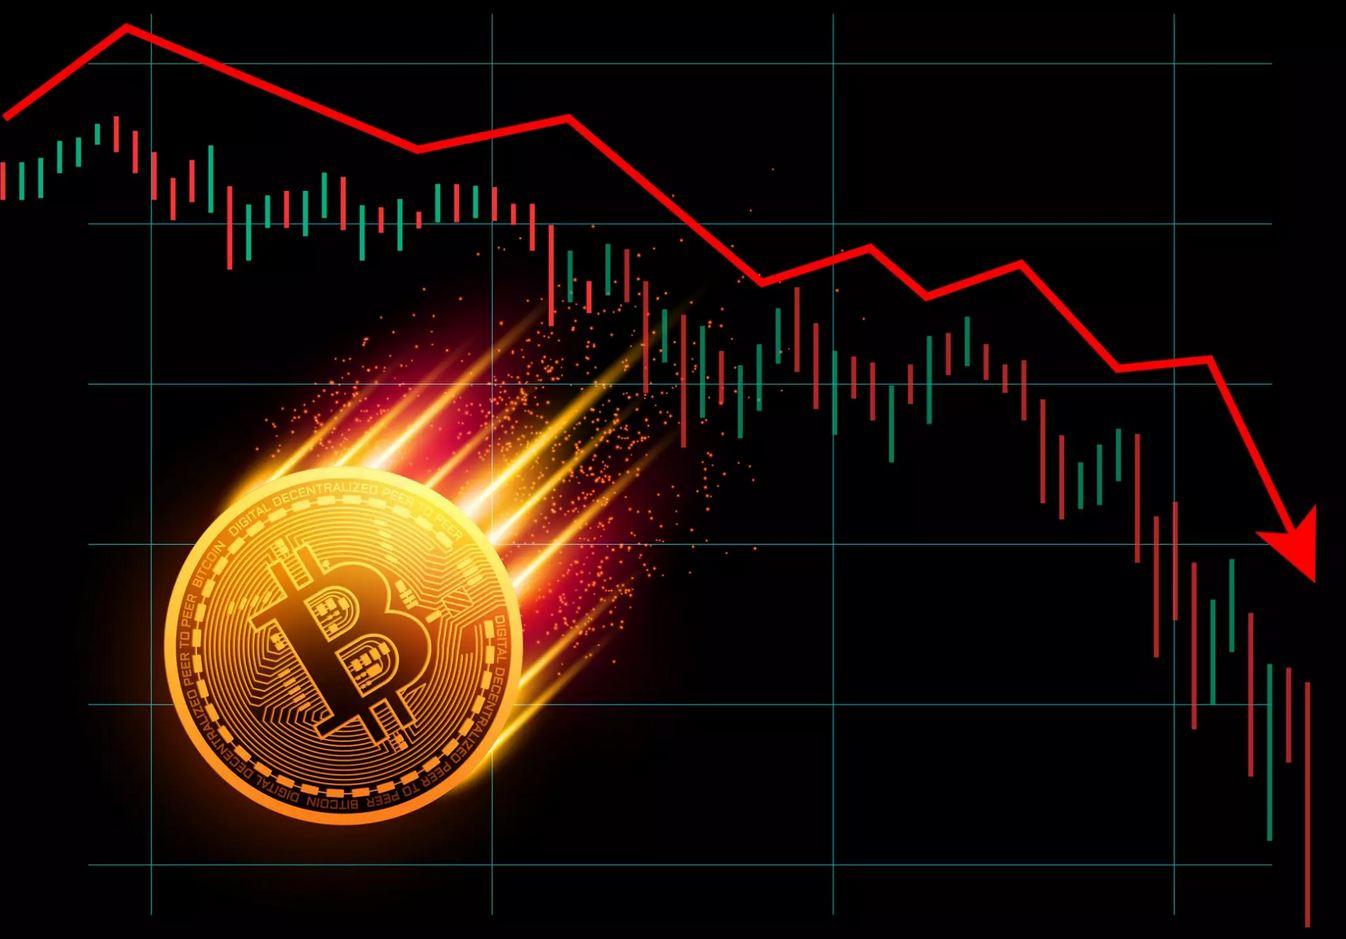 Precio de bitcoin tocó fondo, dice ejecutivo de Fidelity